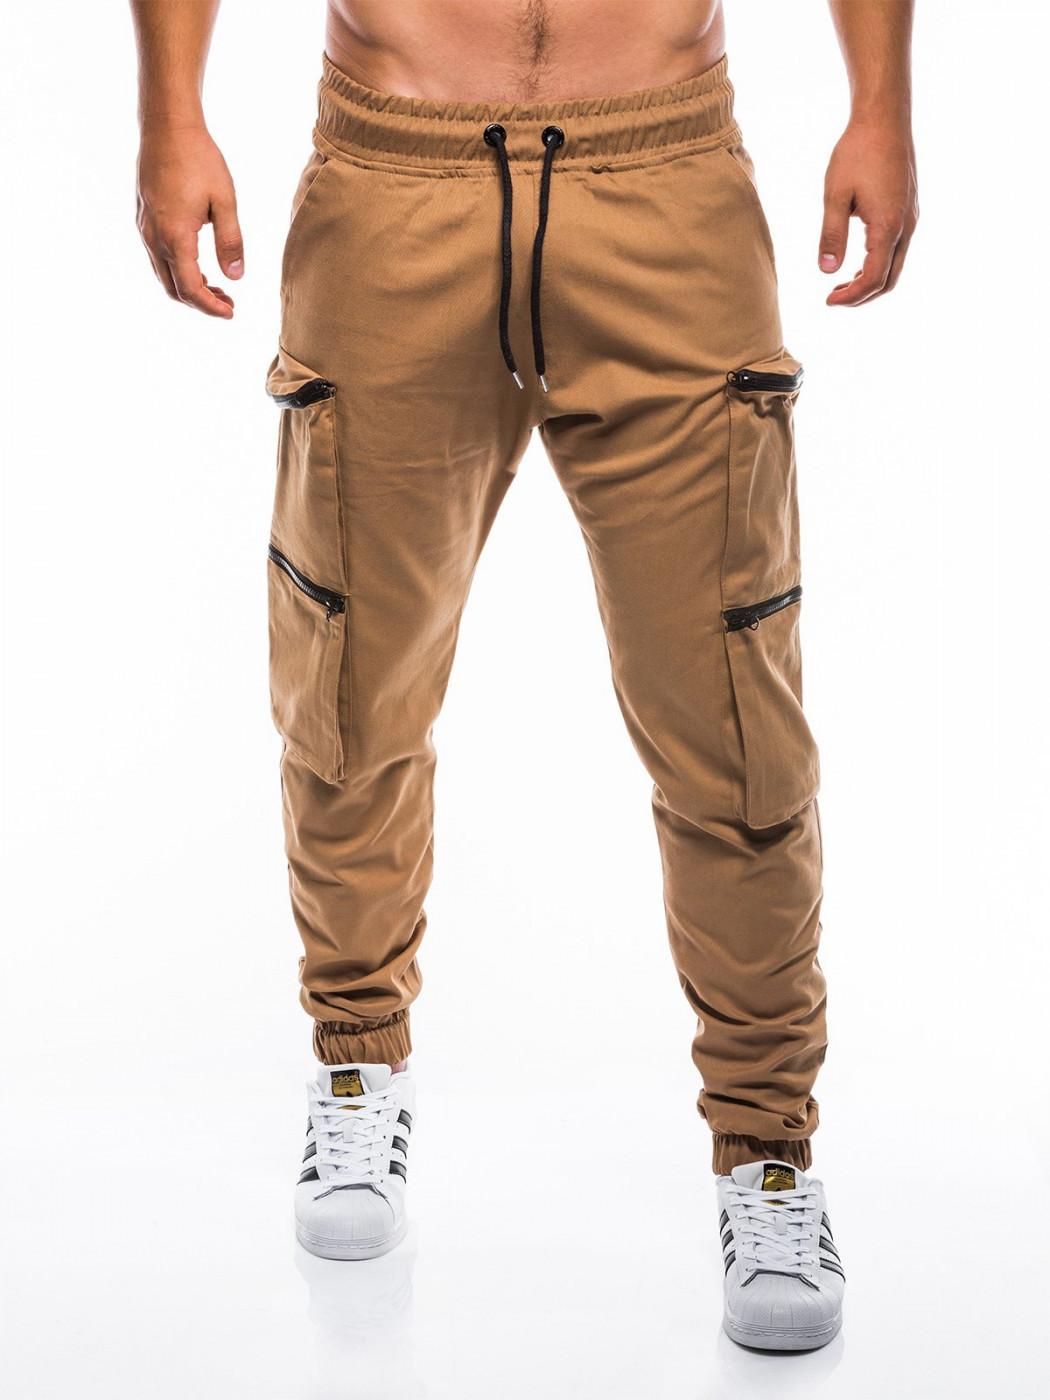 Ombre Clothing Men's pants joggers P706